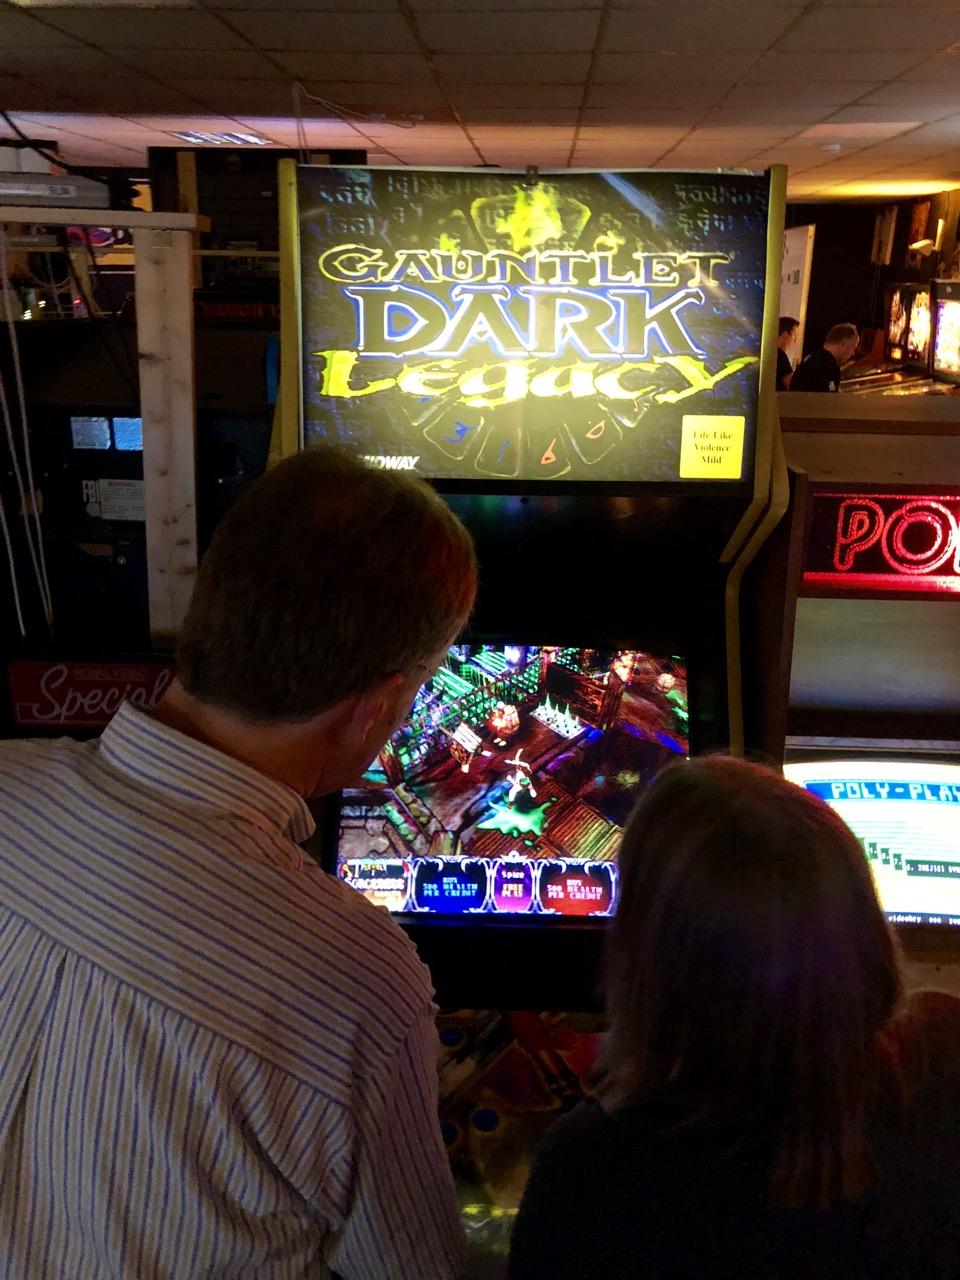 Gemeinsames Spielen am Gauntlet-Automat. (Bild: André Eymann)